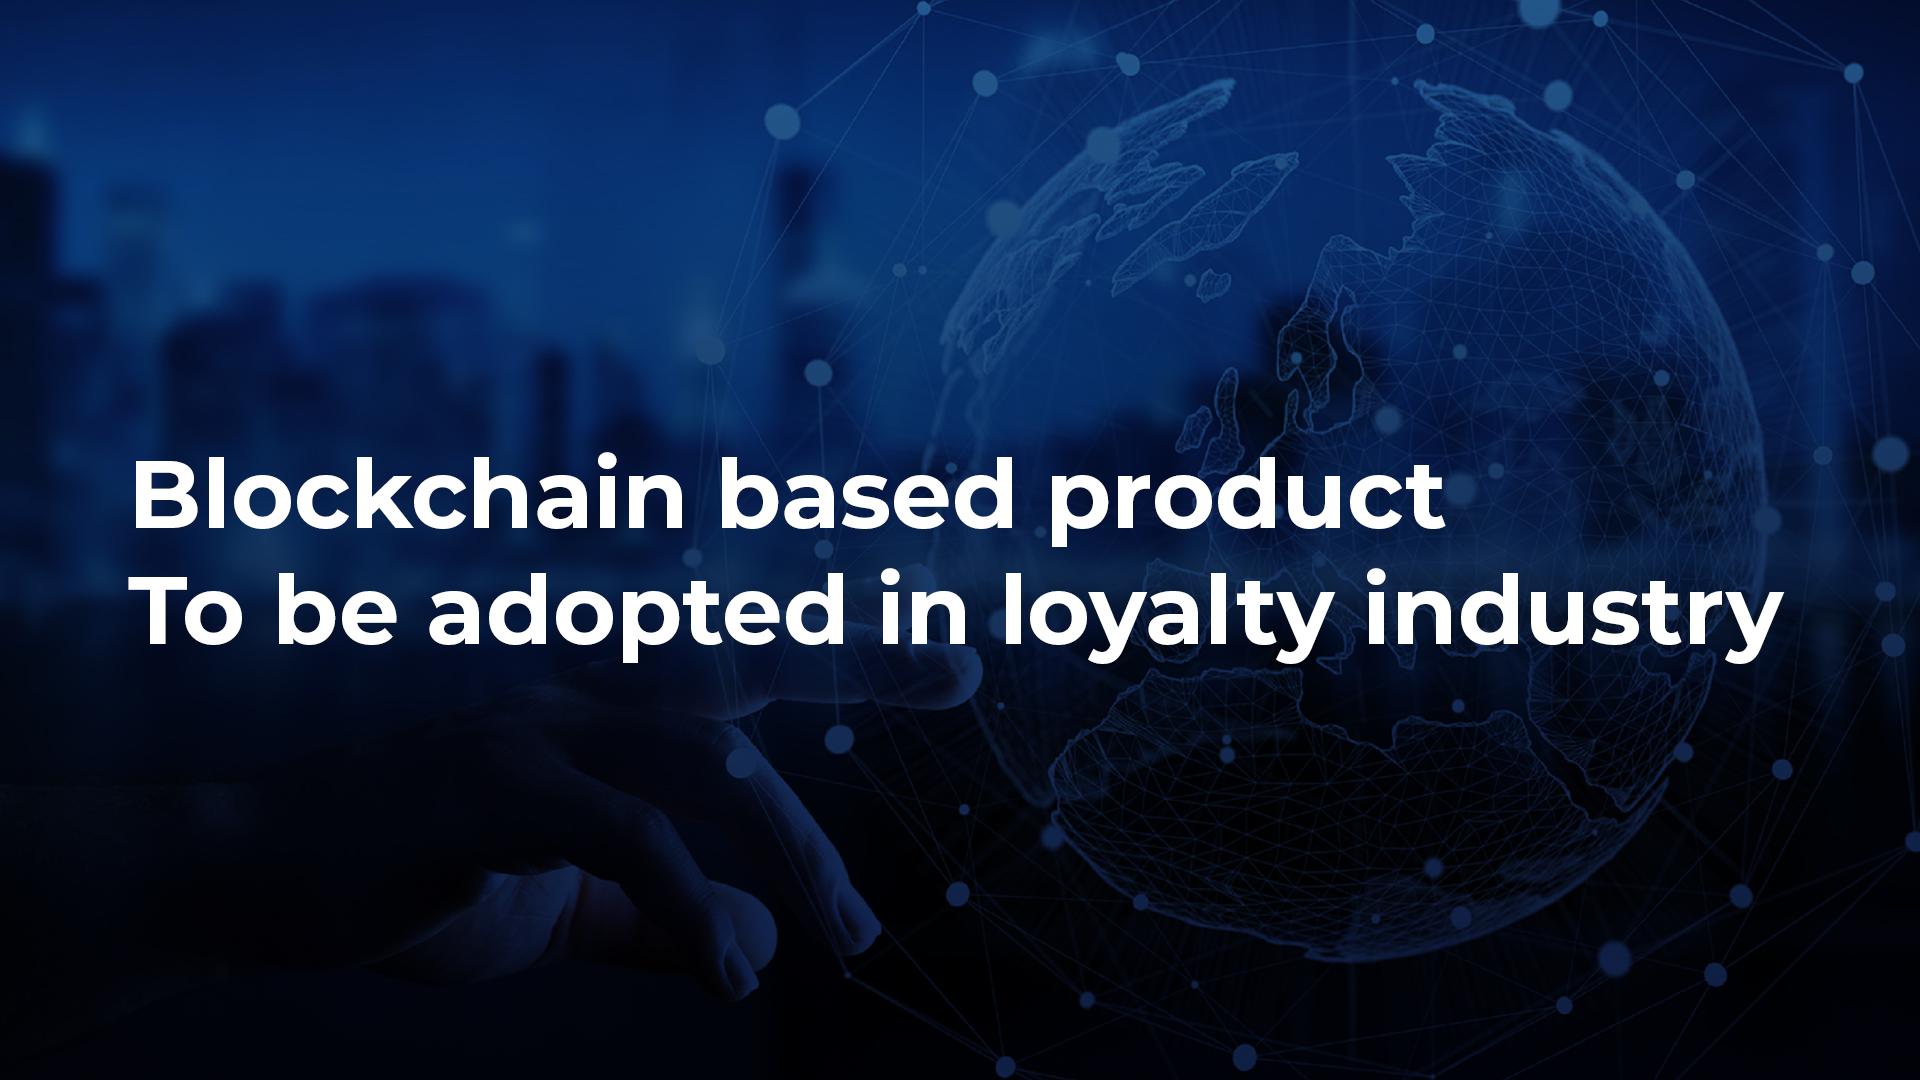 blockchain based loyalty programs